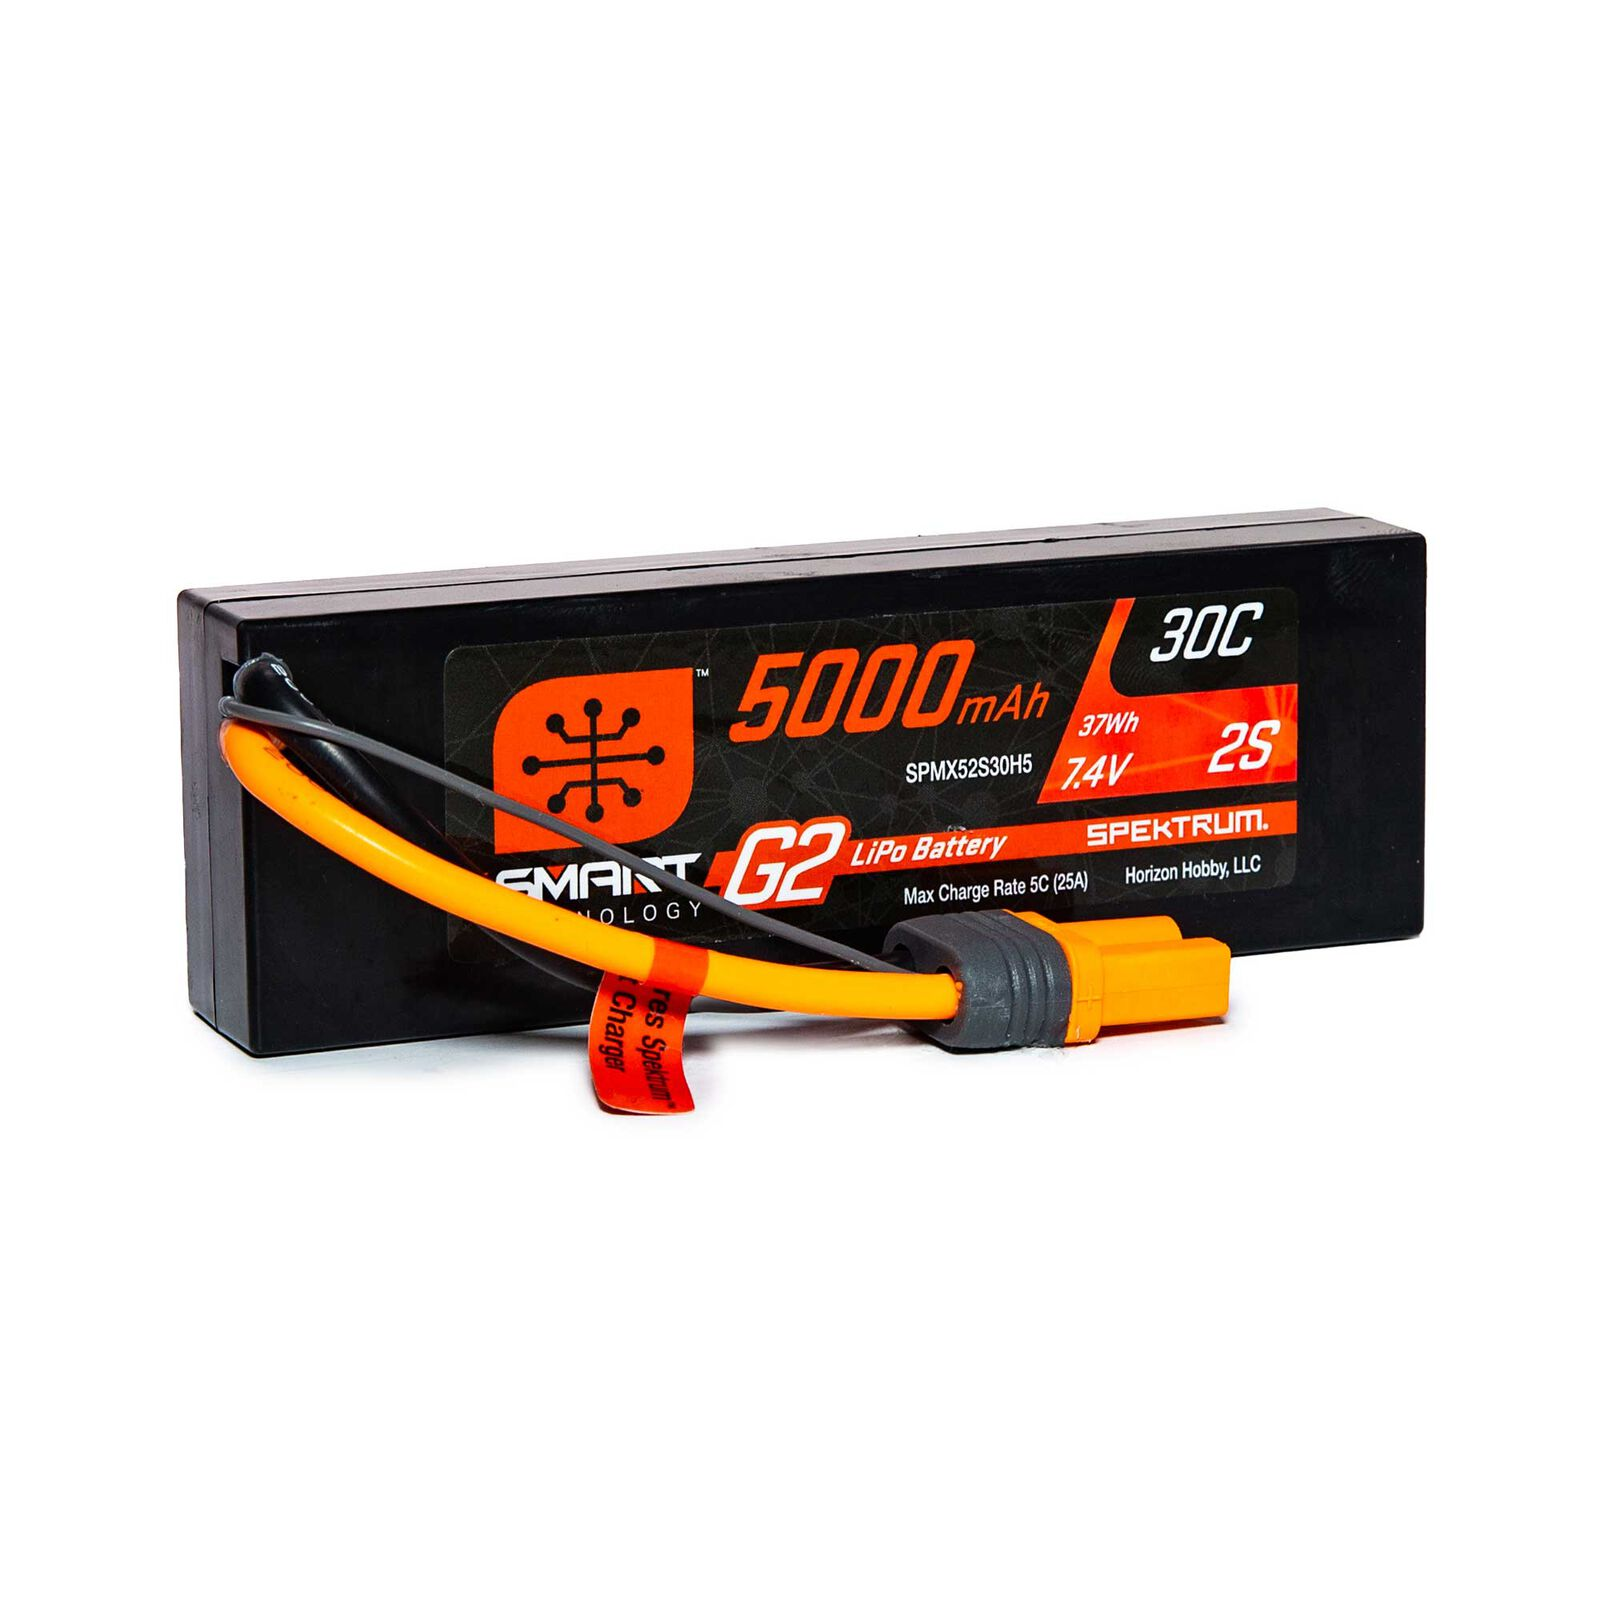 7.4V 5000mAh 2S 30C Smart G2 Hardcase LiPo Battery: IC5